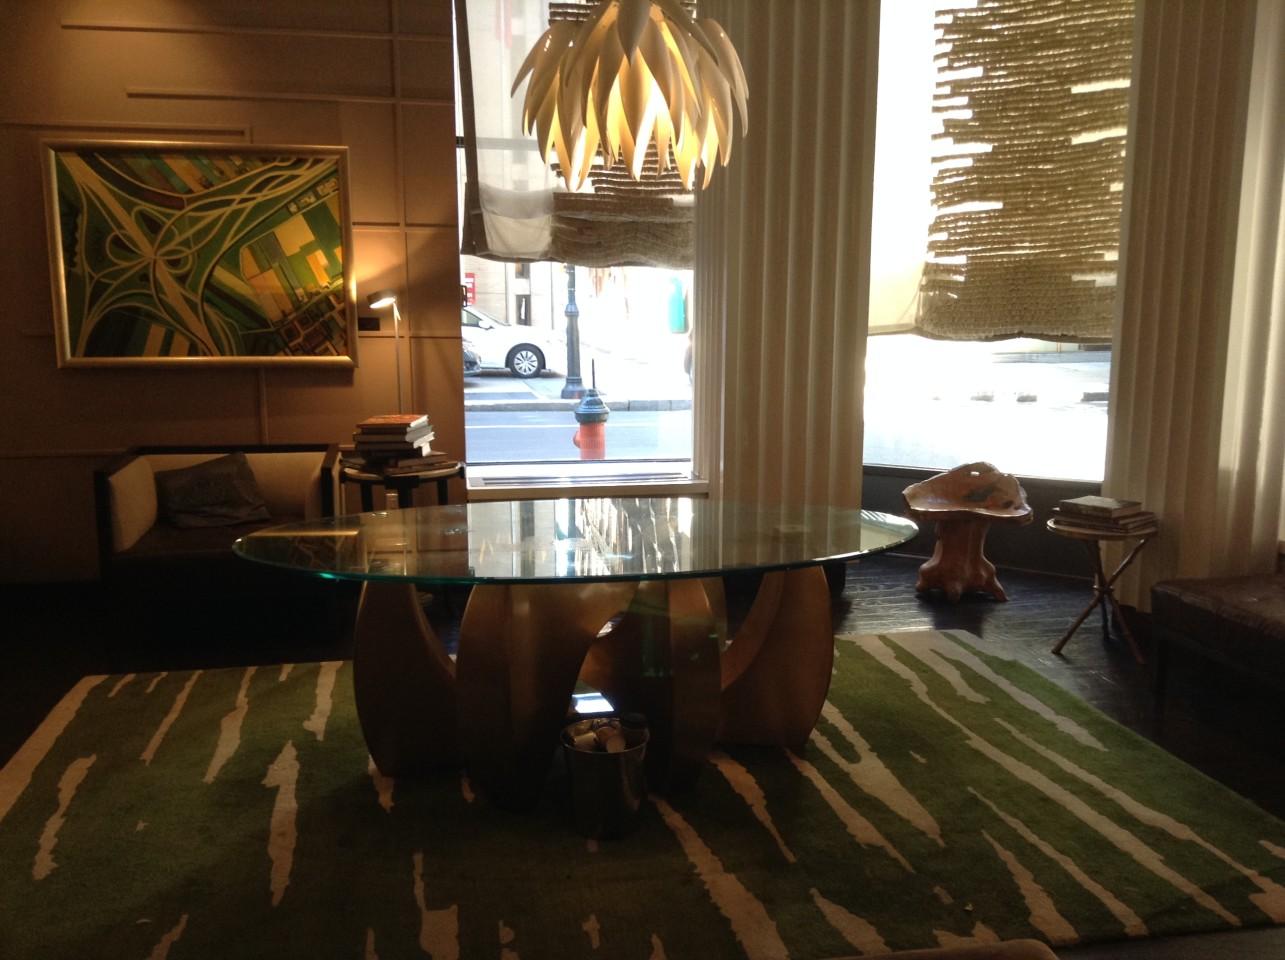 Hotel Palomar Philadelphia Review - Rittenhouse Boutique Hotel